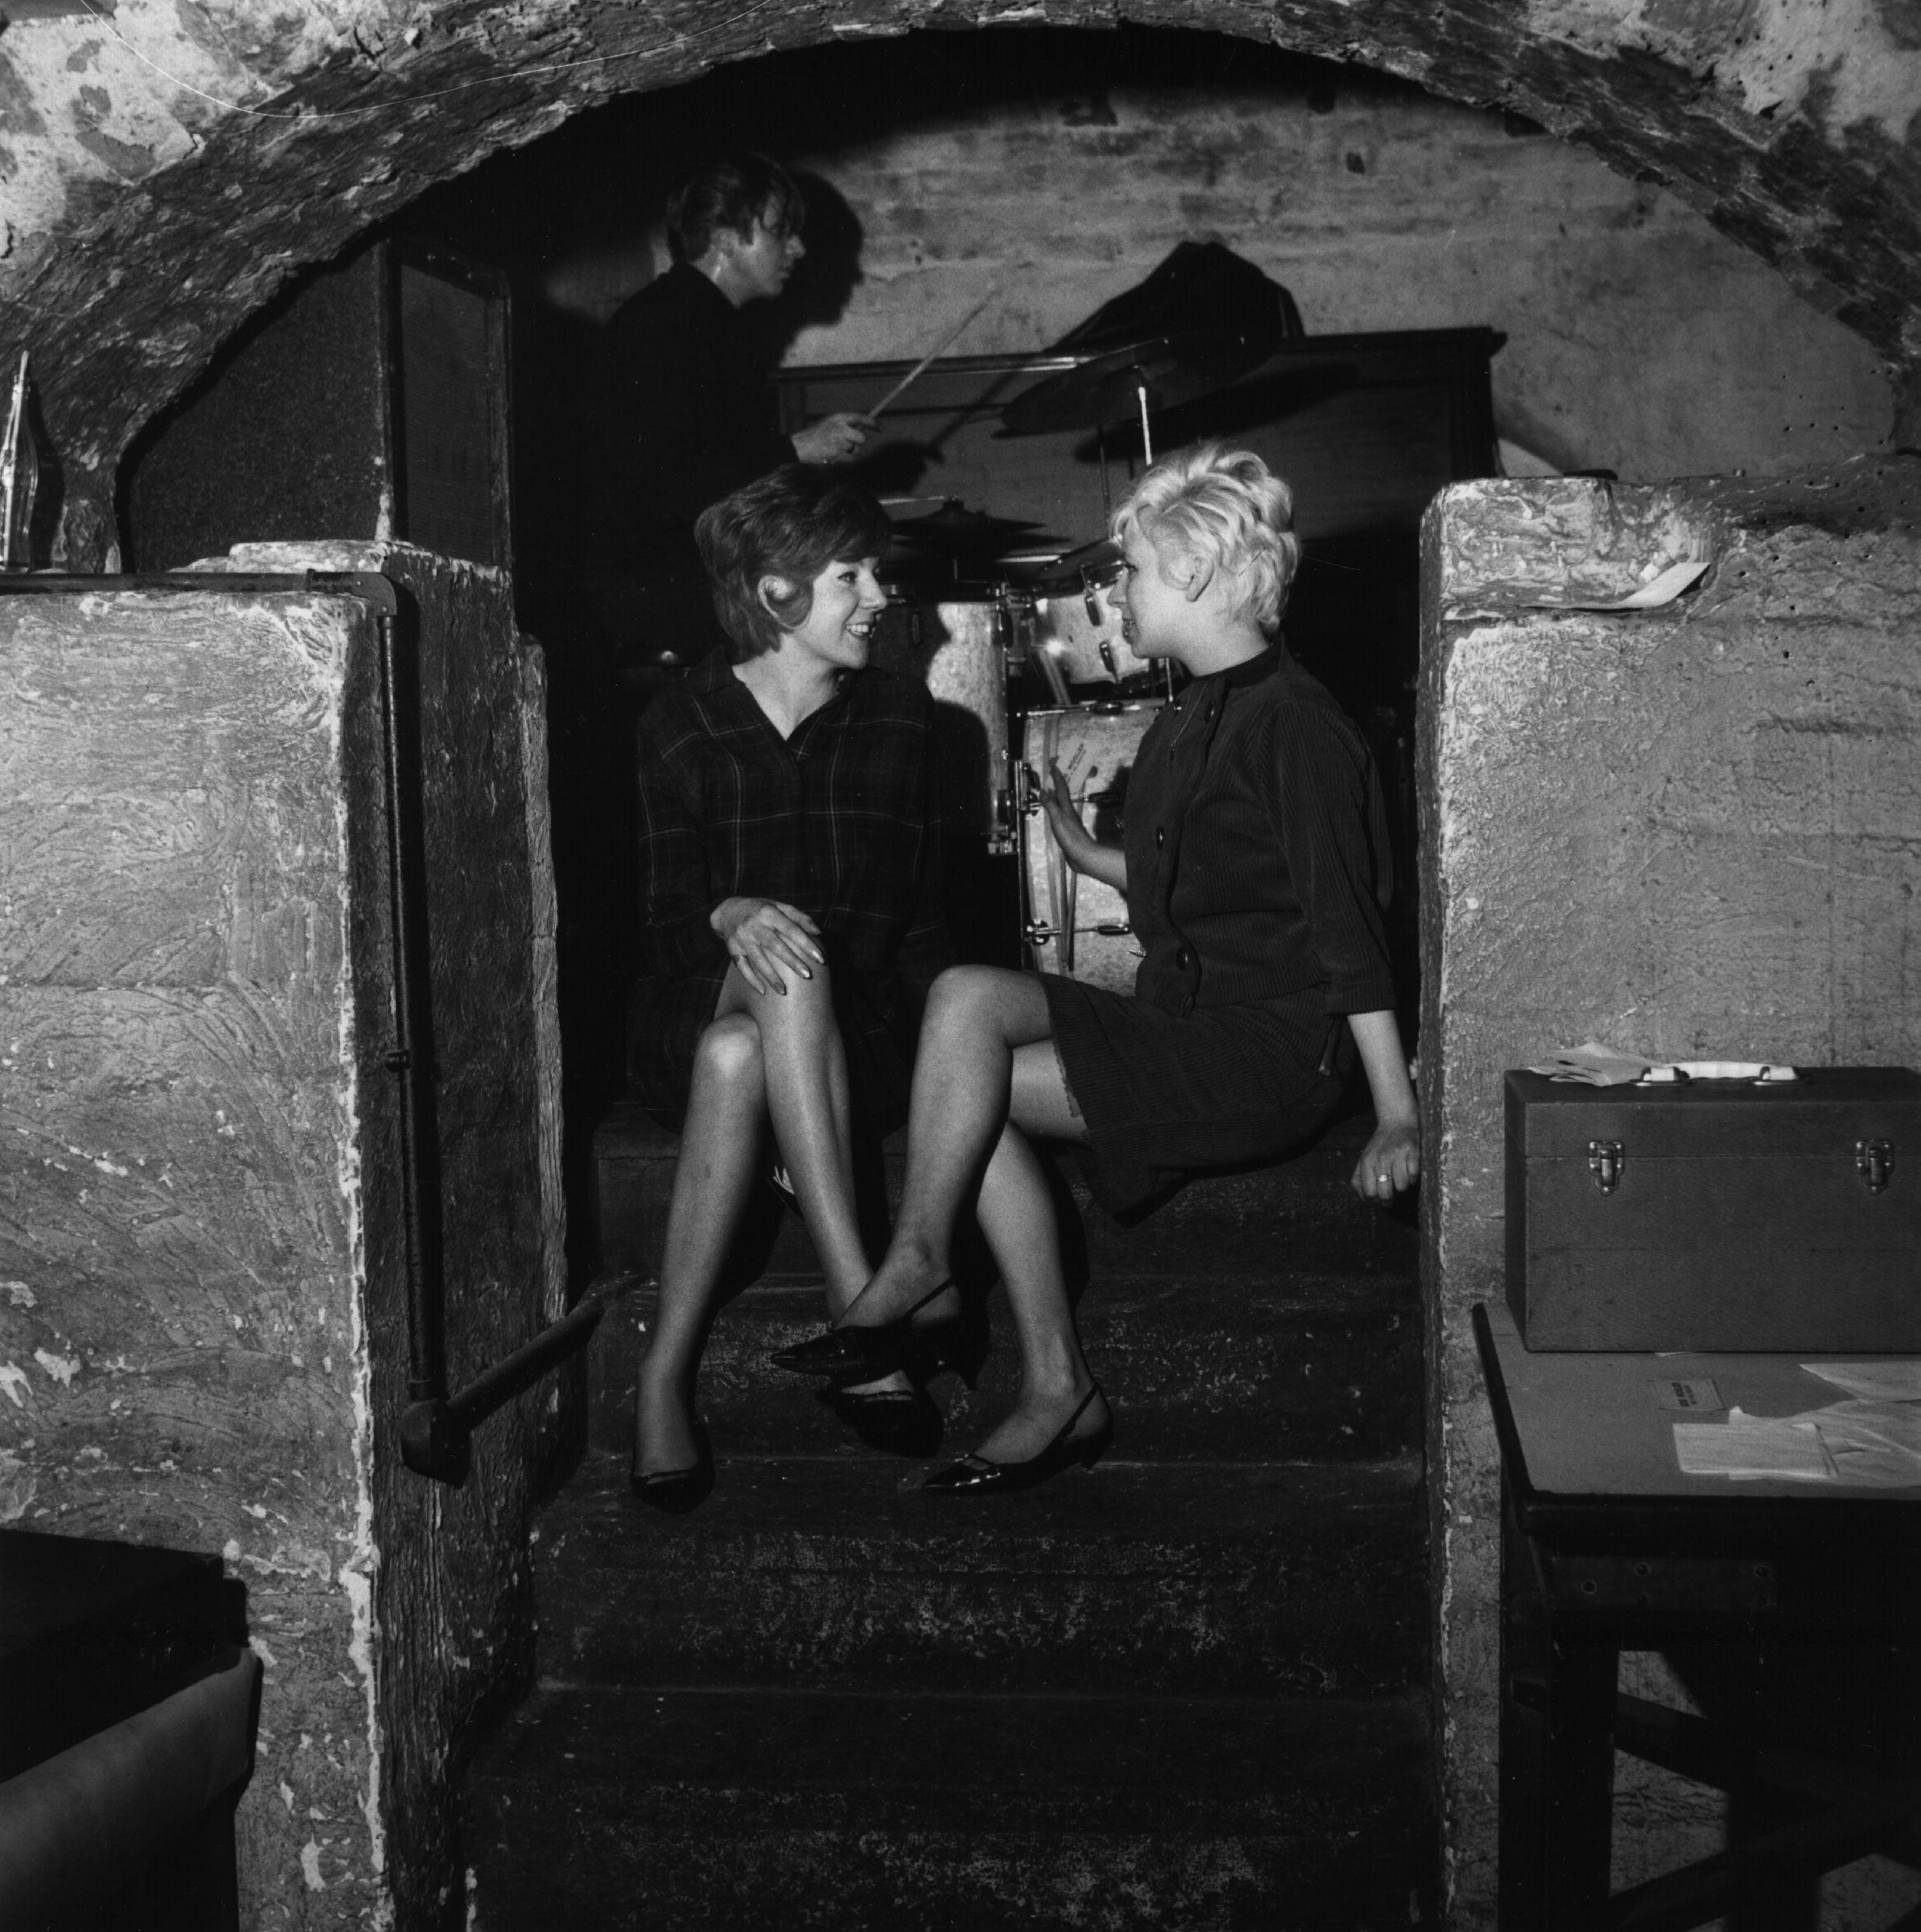 Cilla Black At The Cavern